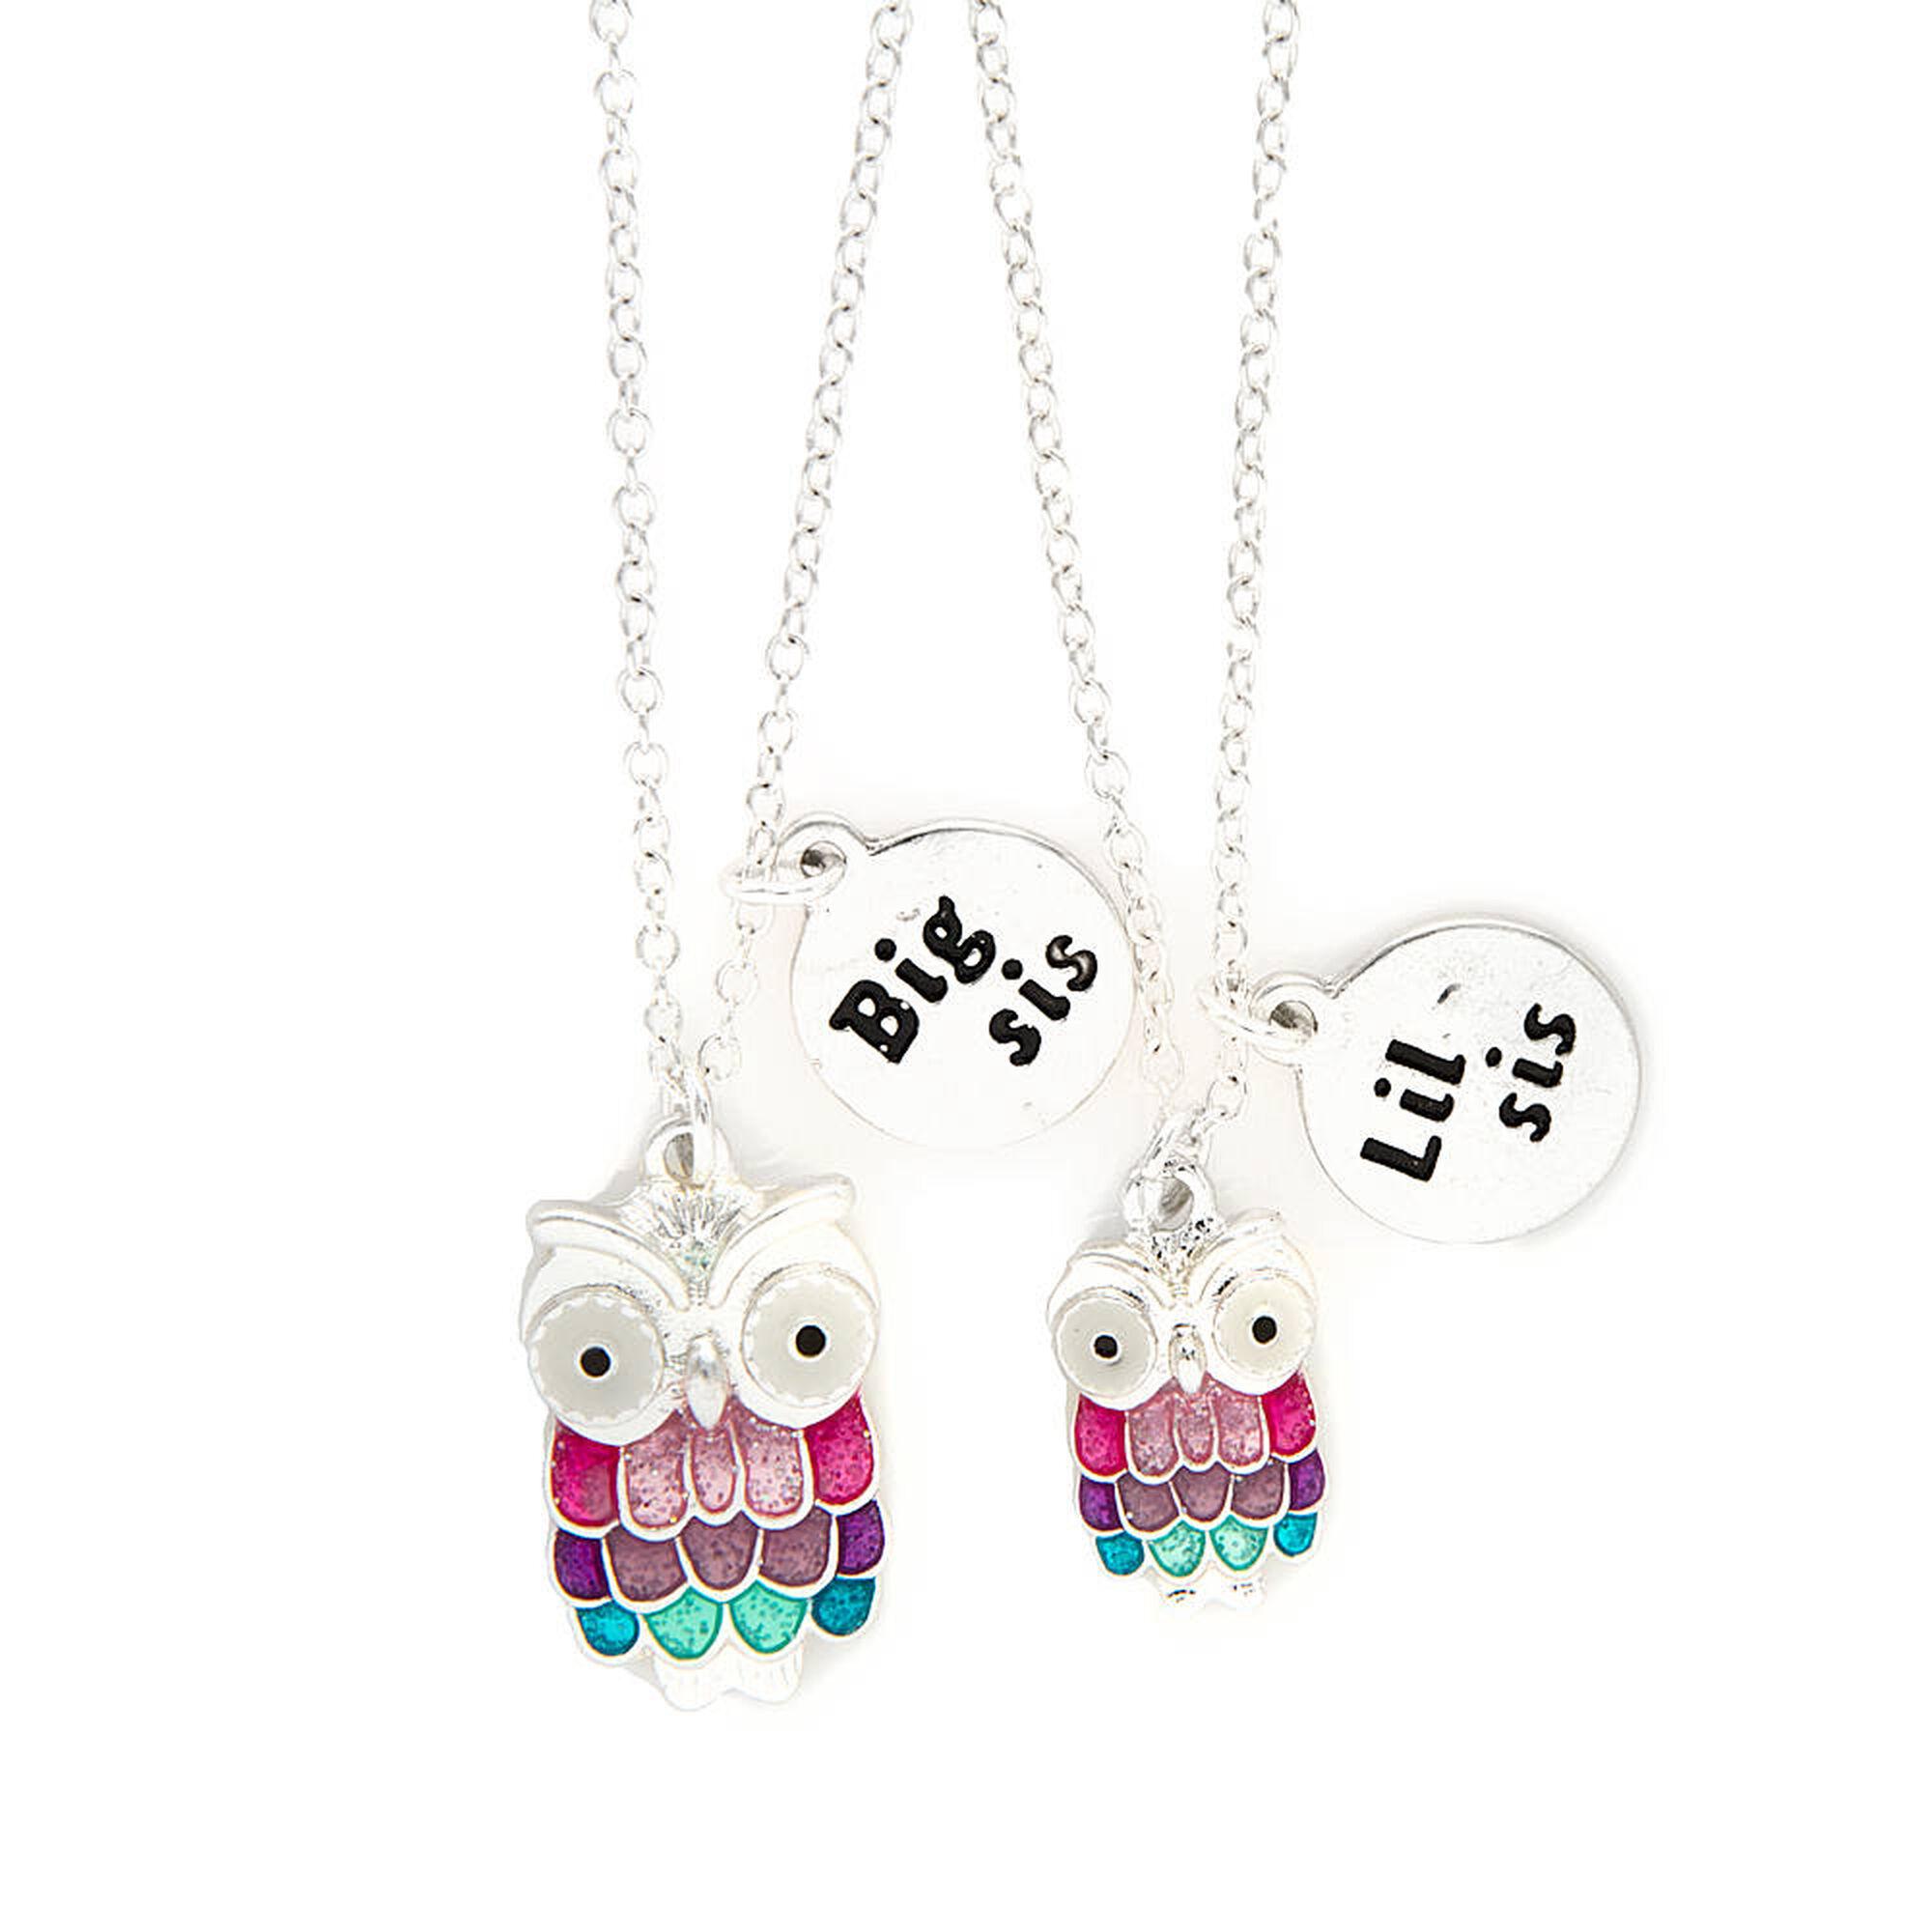 Big sis little sis pastel glitter owl pendant necklaces claires ca big sis little sis pastel glitter owl pendant necklaces mozeypictures Choice Image